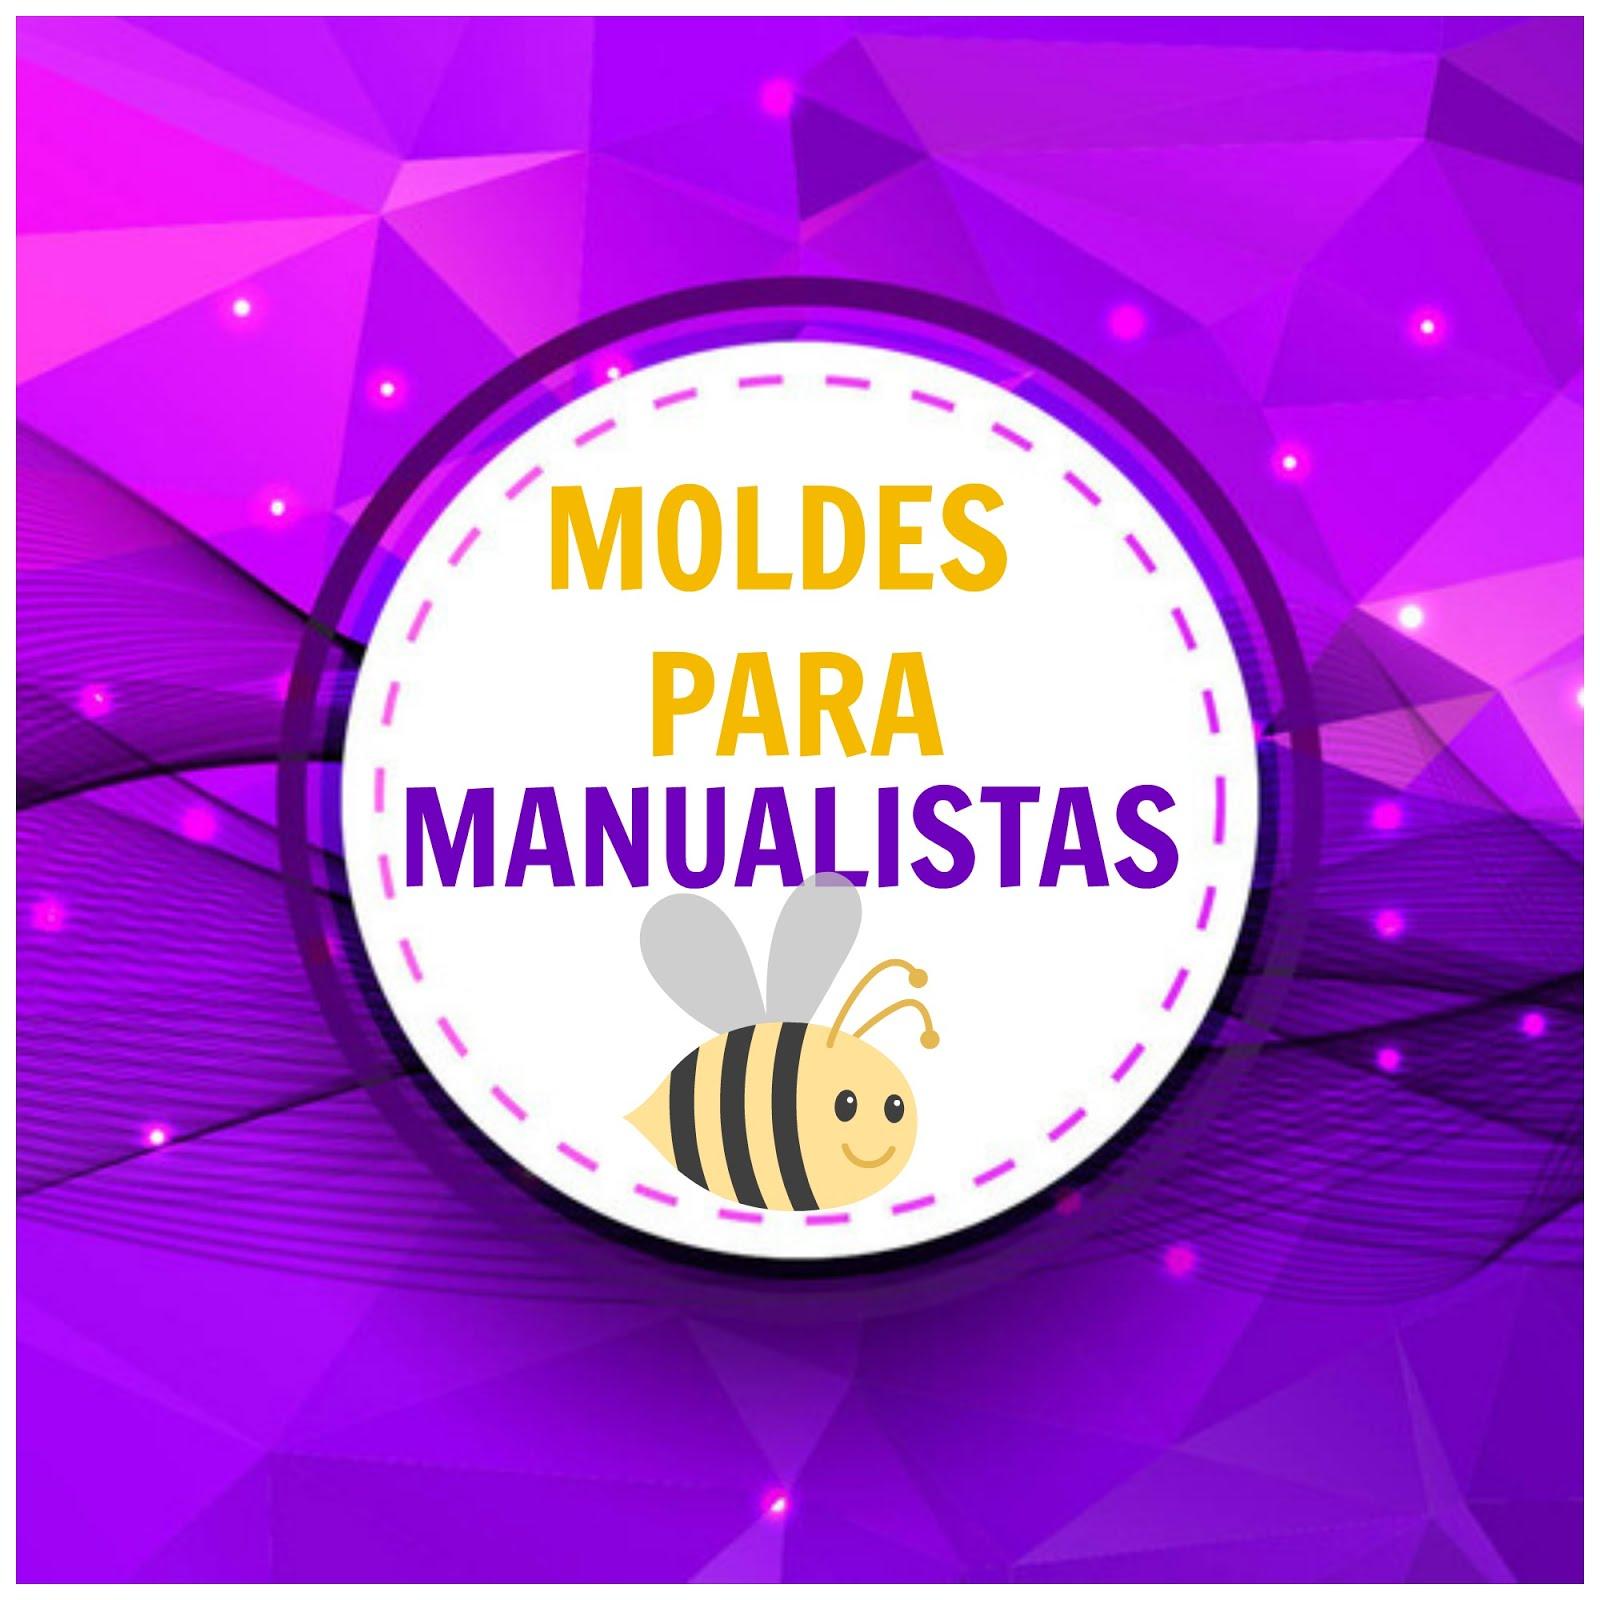 Tienda de Moldes Premium